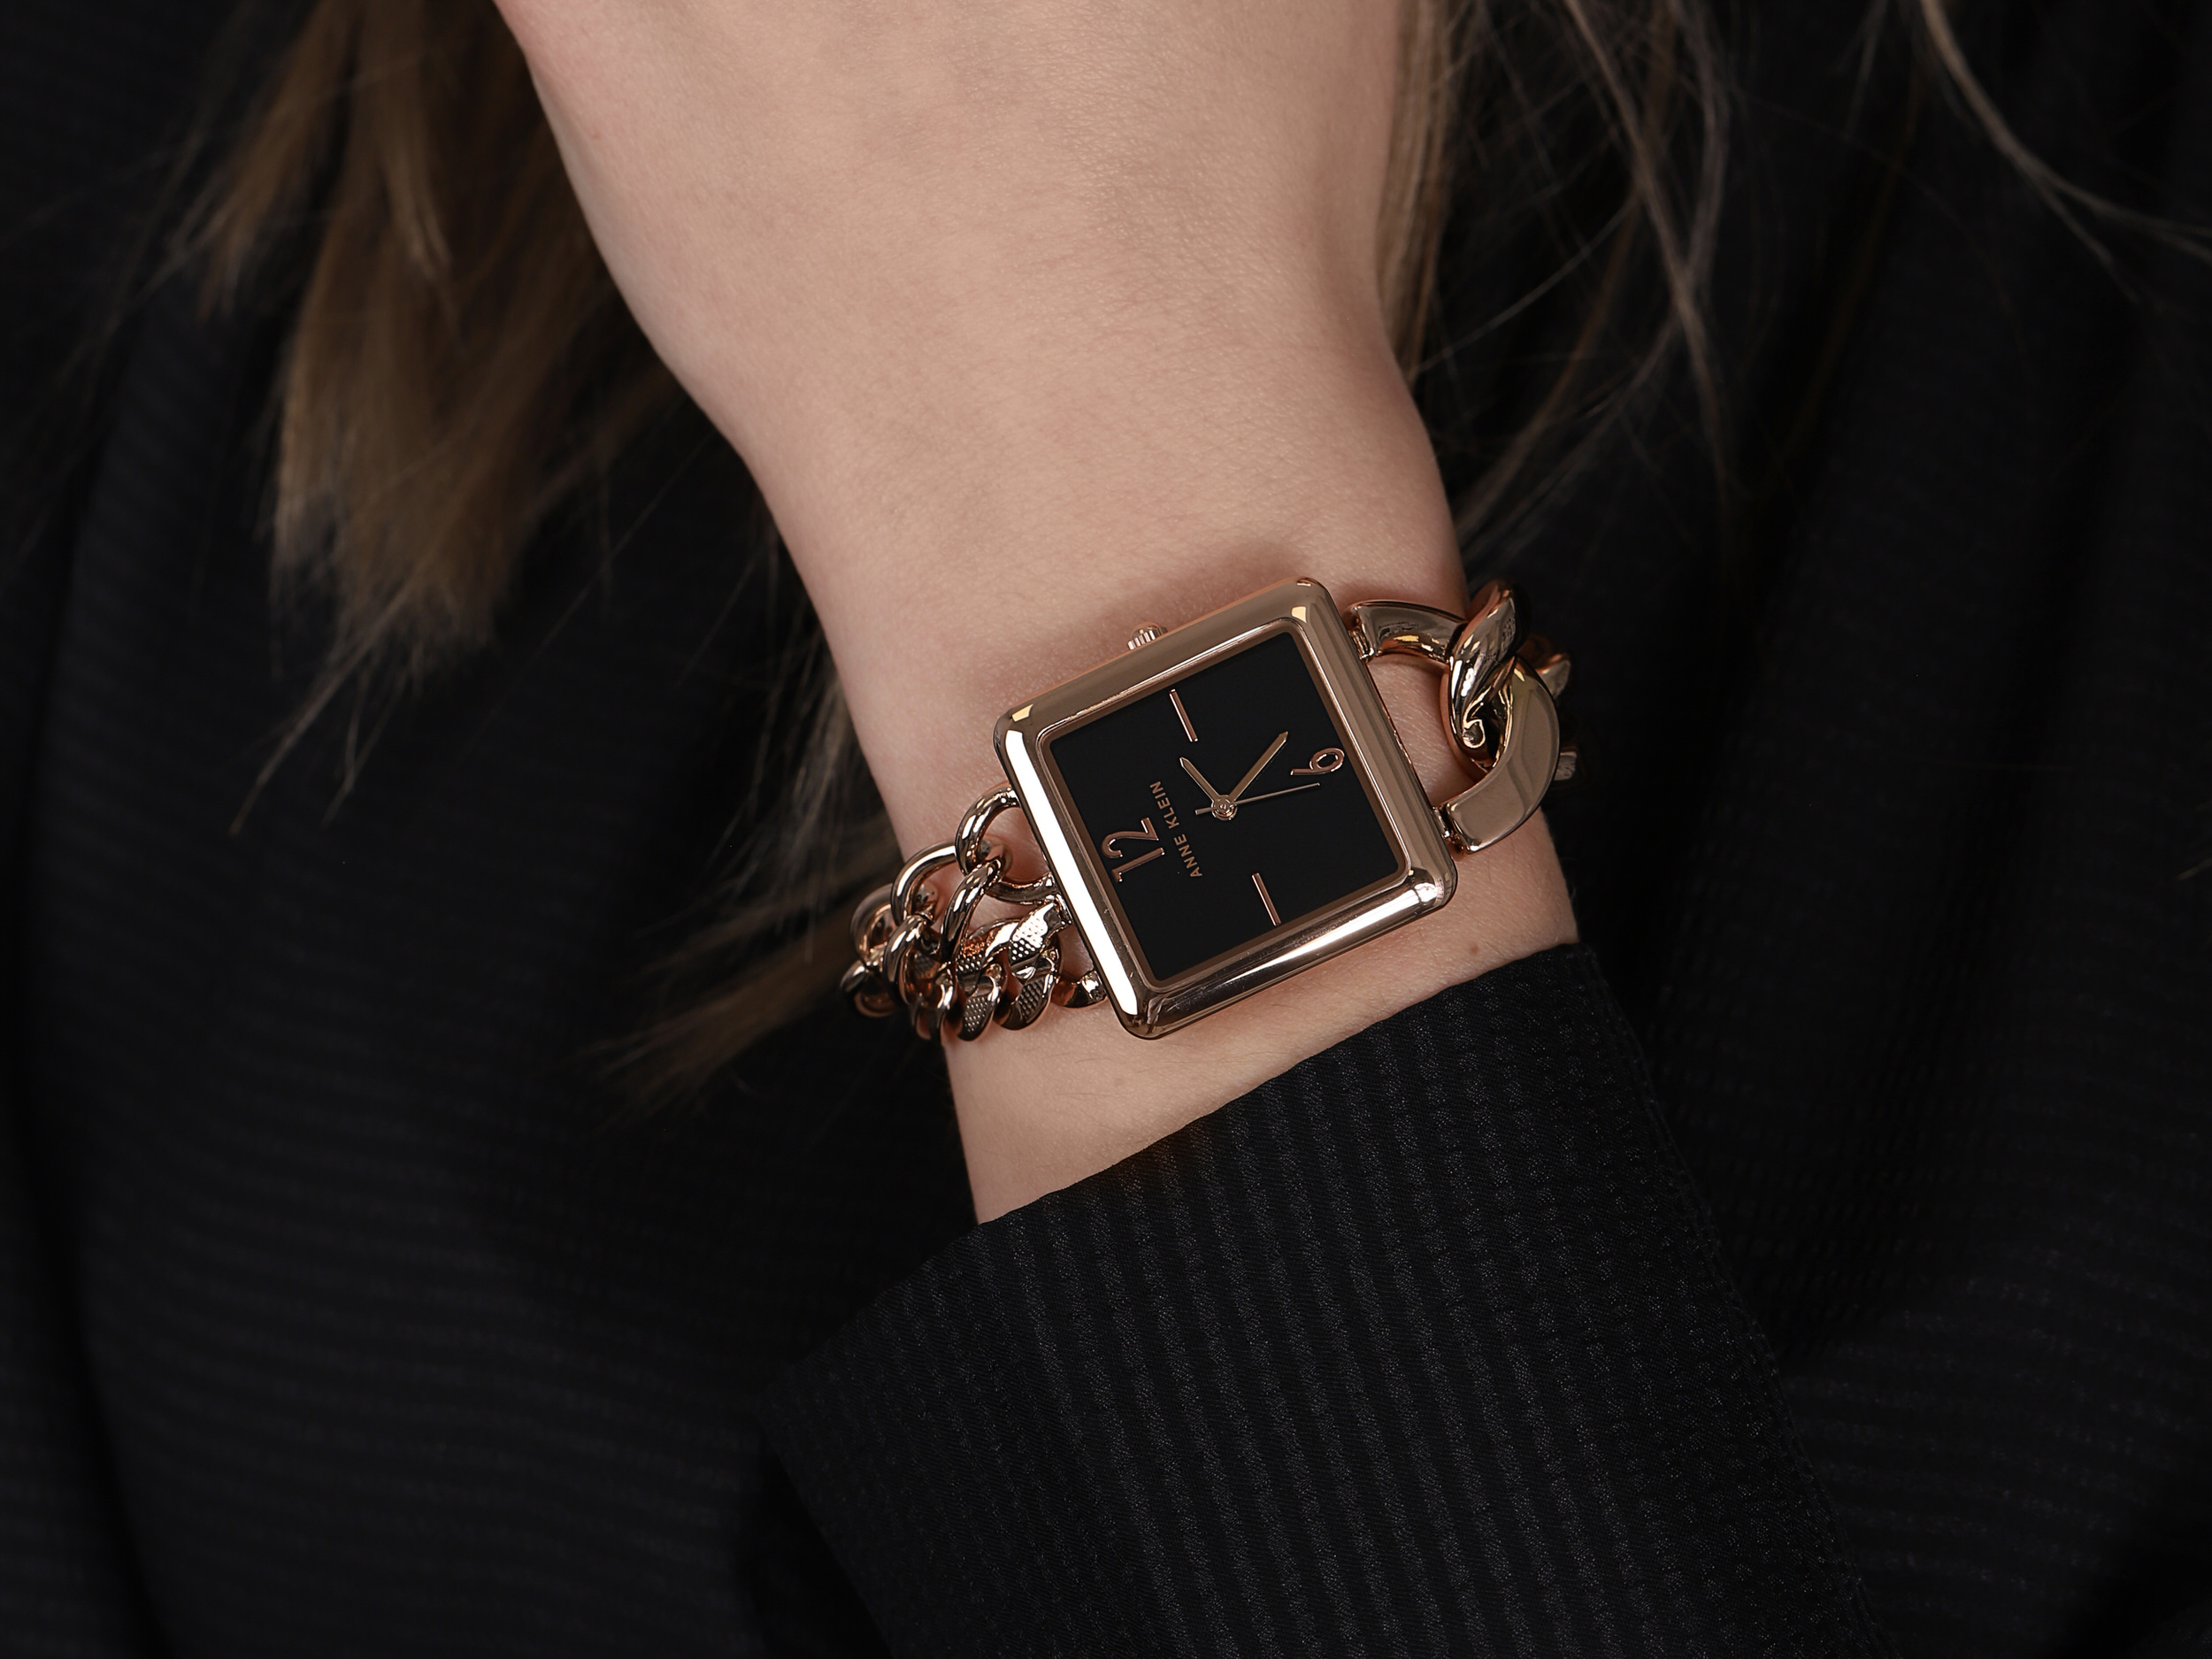 Anne Klein AK-3804BKRG damski zegarek Bransoleta bransoleta